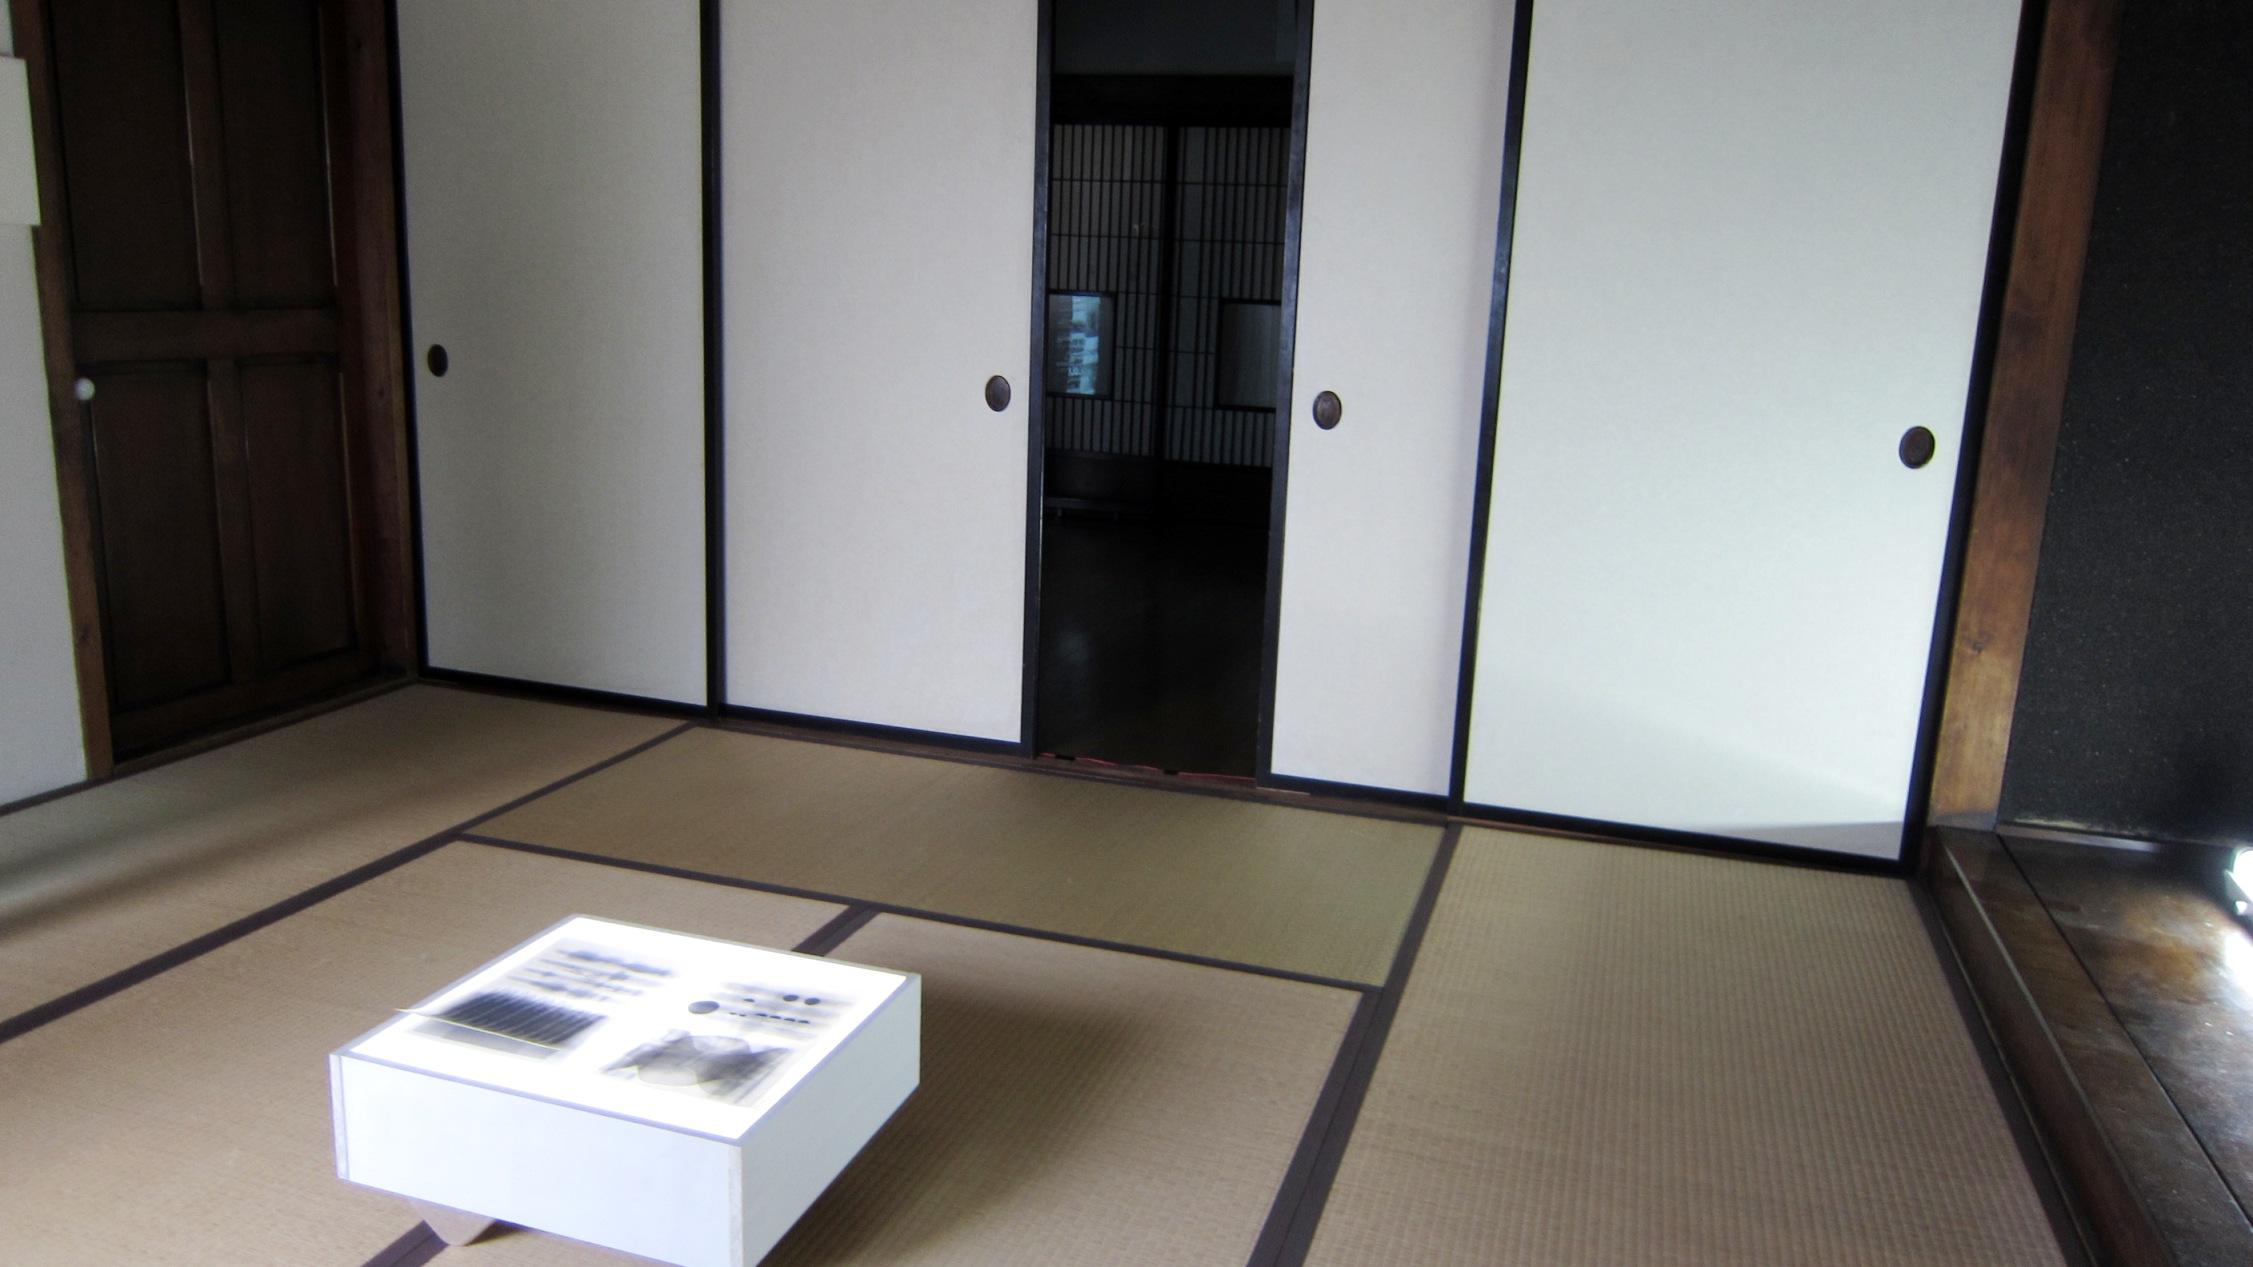 2035)「上野麗市 個展 『De\'tente デタント』」 g.犬養 4月17日(水)~4月29日(月)_f0126829_8364569.jpg